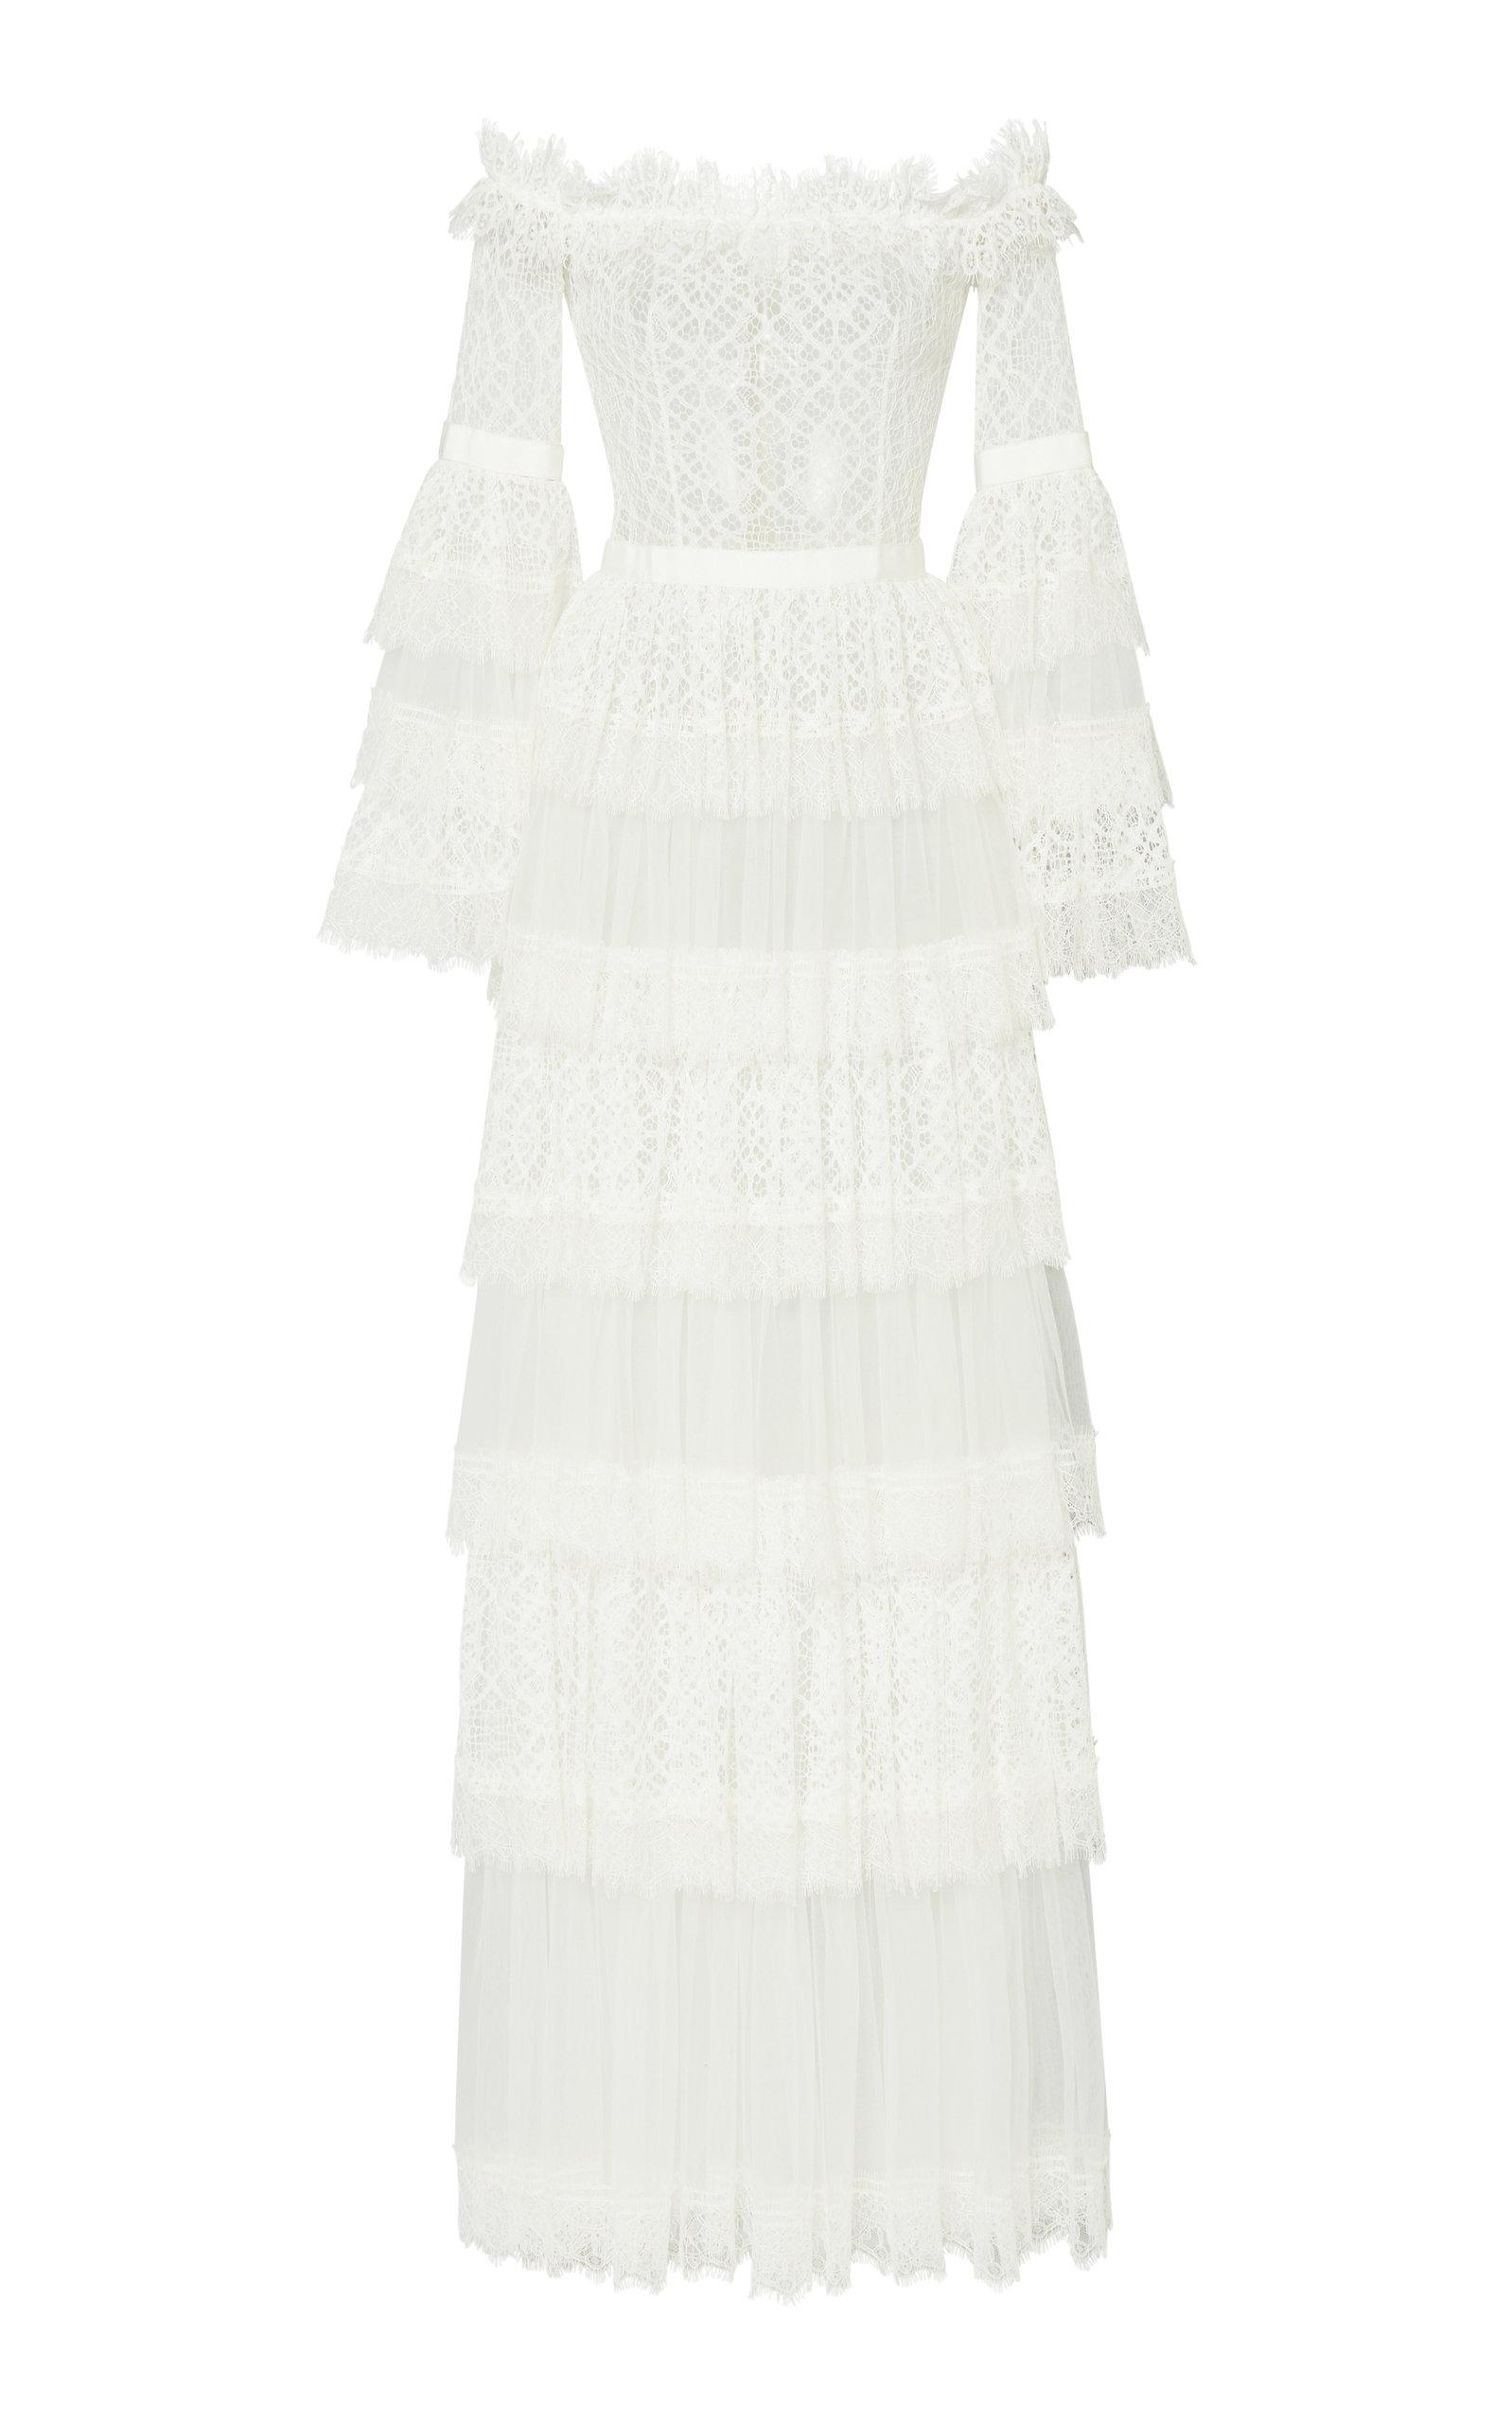 Buy Zuhair Murad Off-The-Shoulder Chantilly Lace Dress online, shop Zuhair Murad at the best price